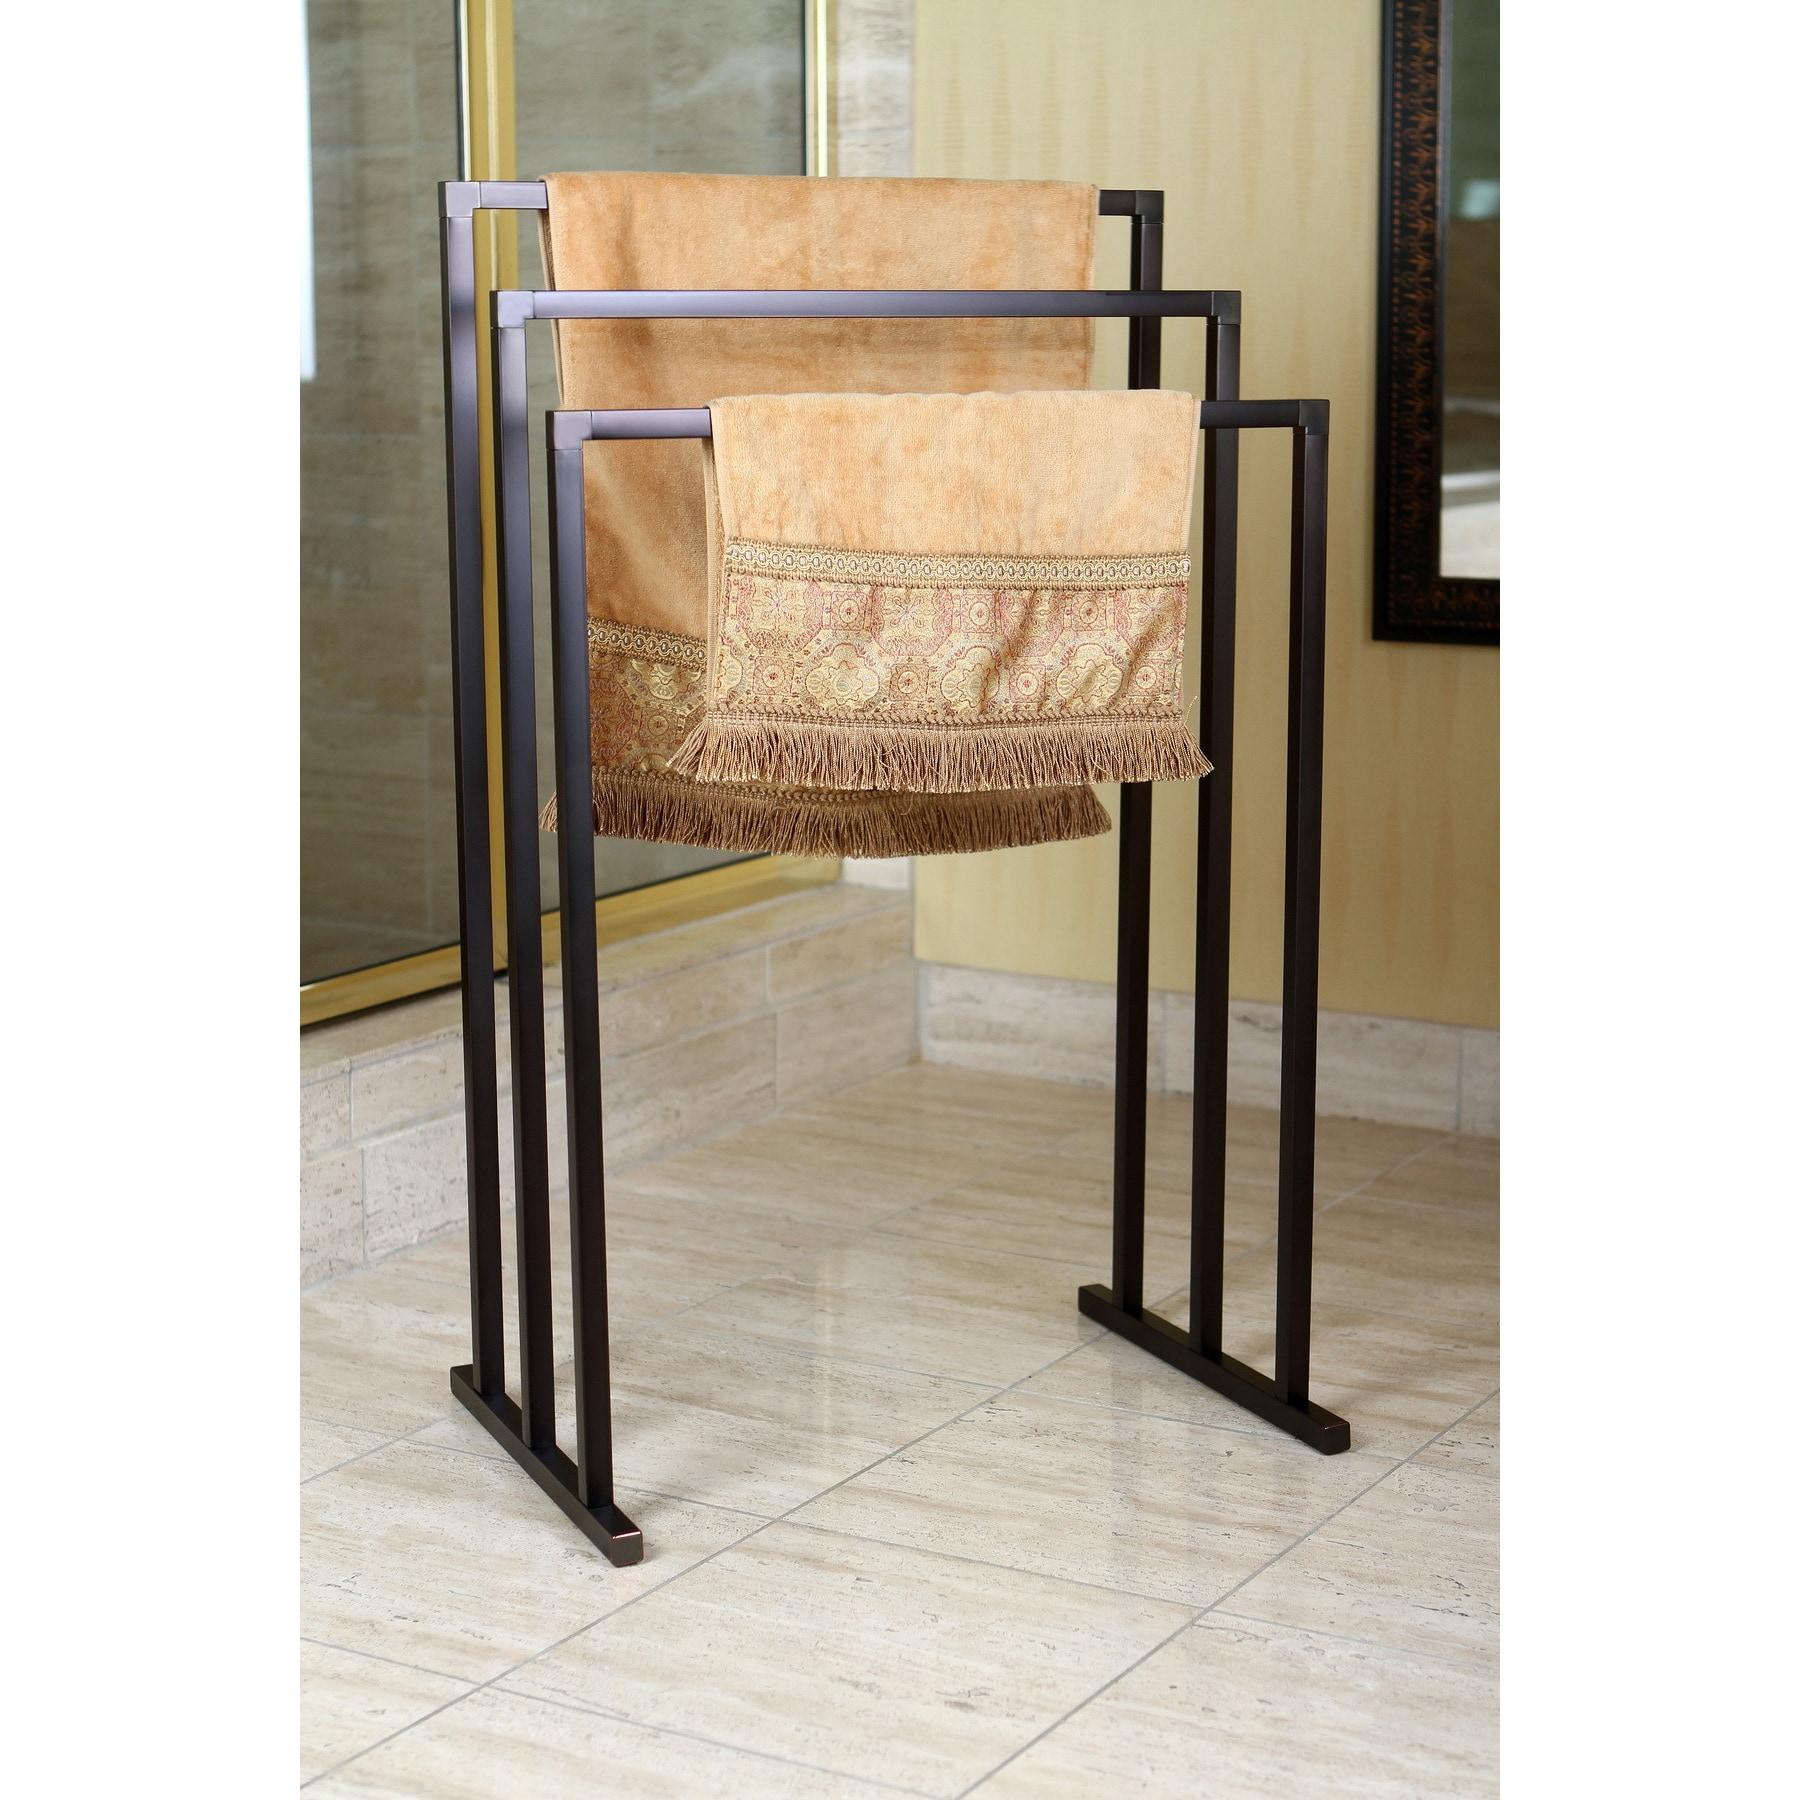 Kingston Brass Pedestal Oil-rubbed Bronze 3-tier Iron Towel Rack